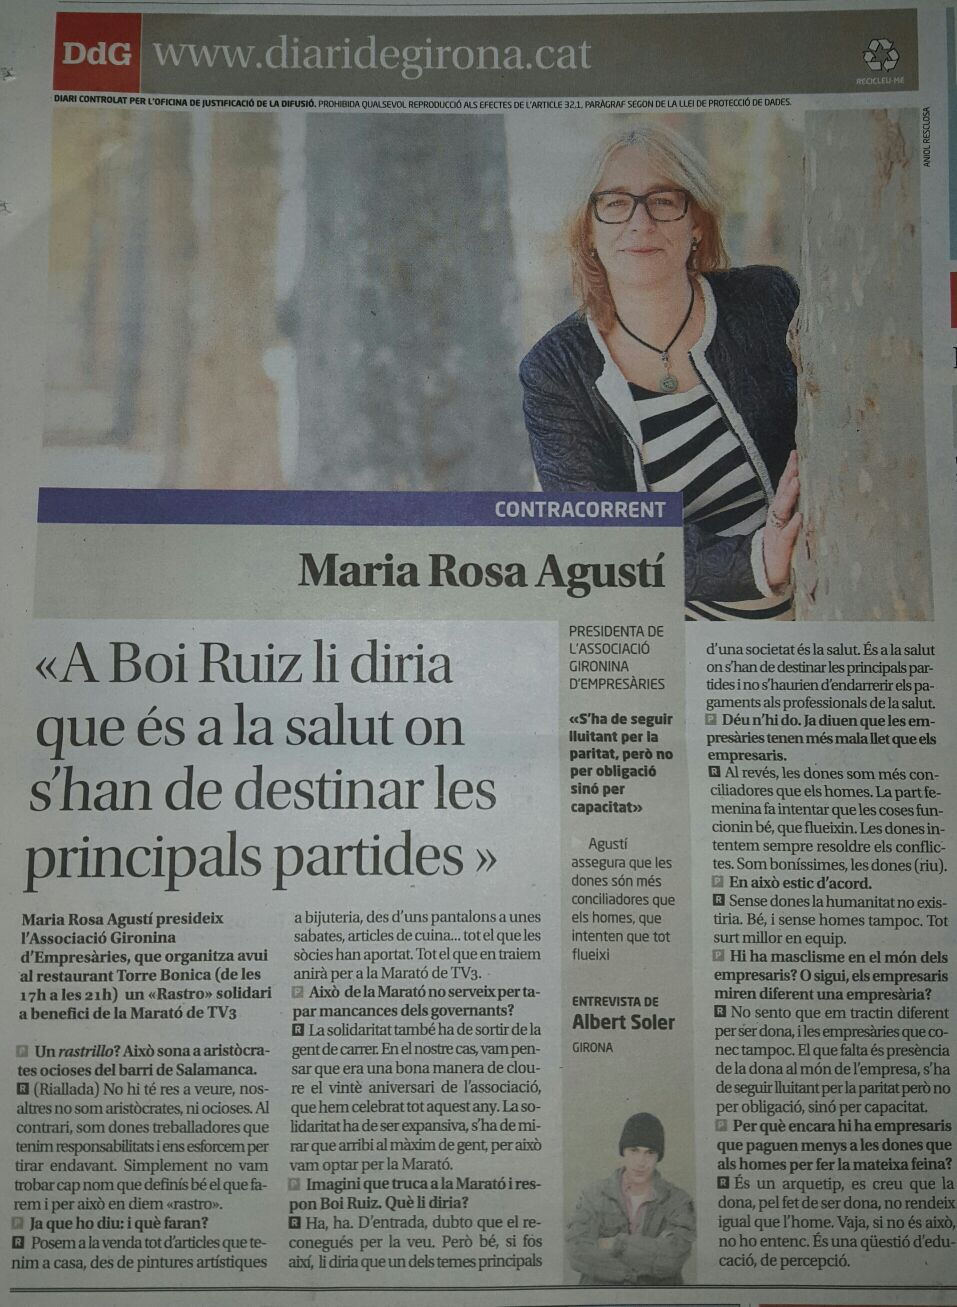 MRosa_Agusti_Diari_de_Girona